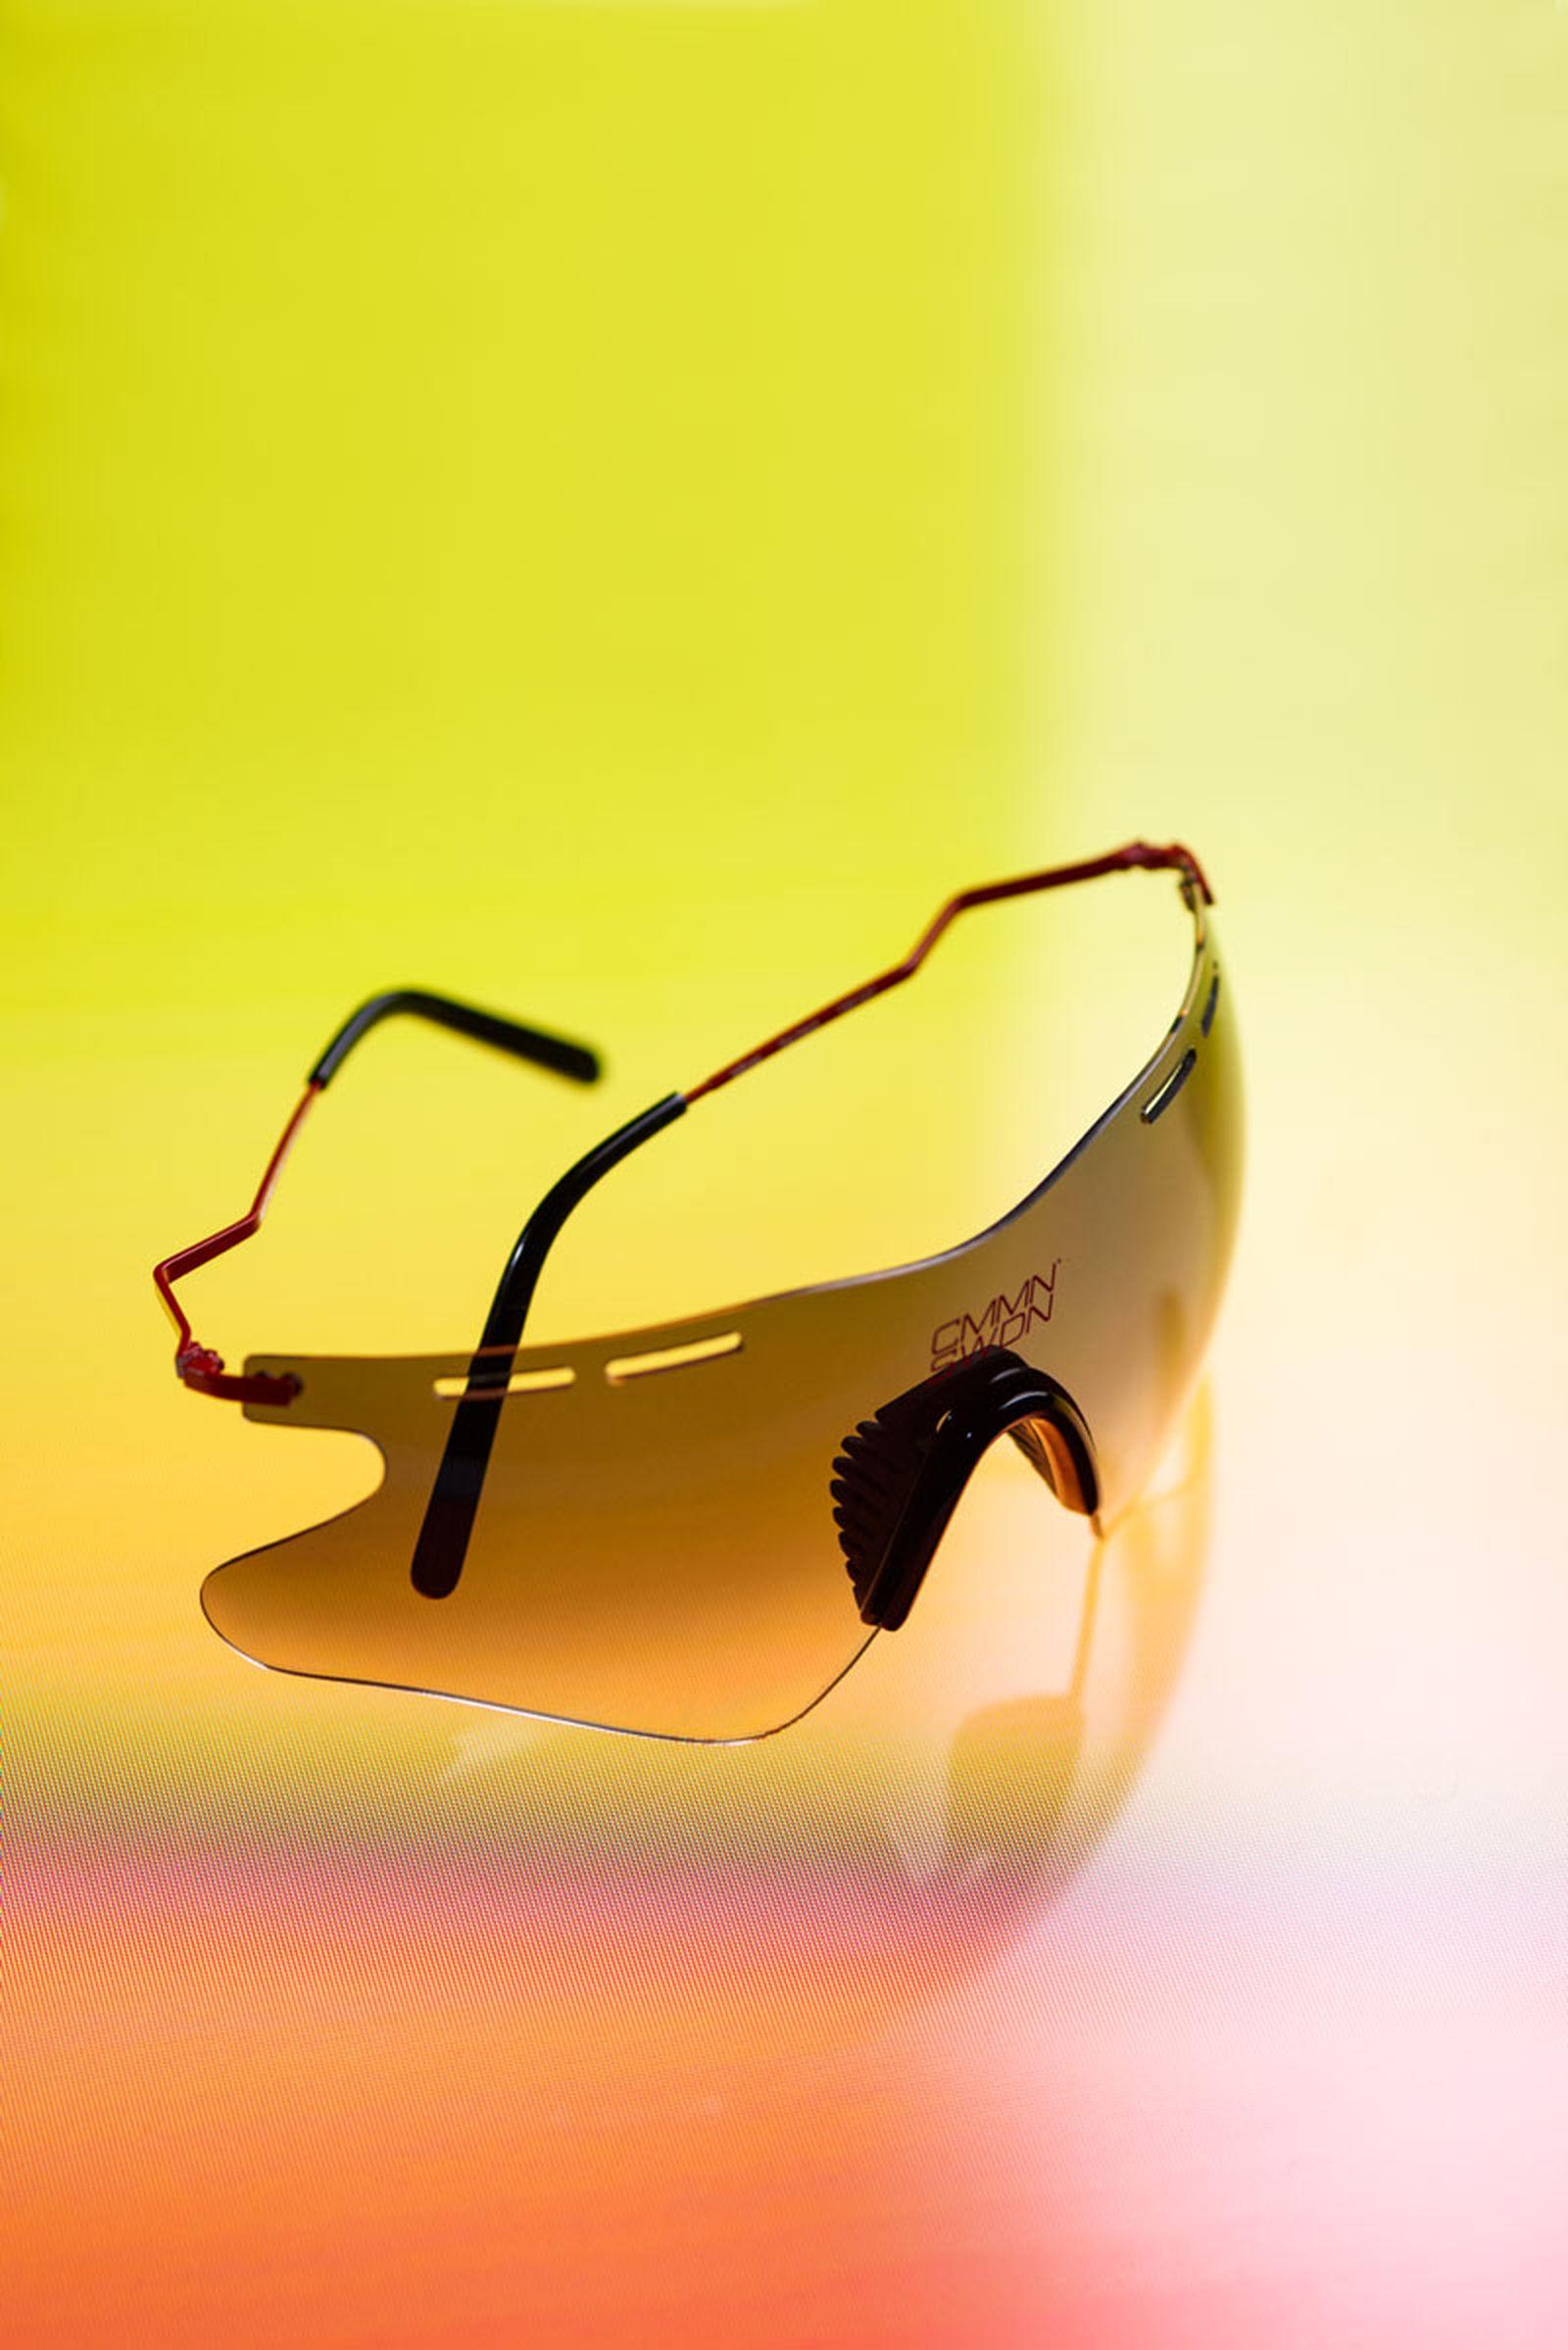 3cmmn swdn sunglasses ss19 Ace & Tate